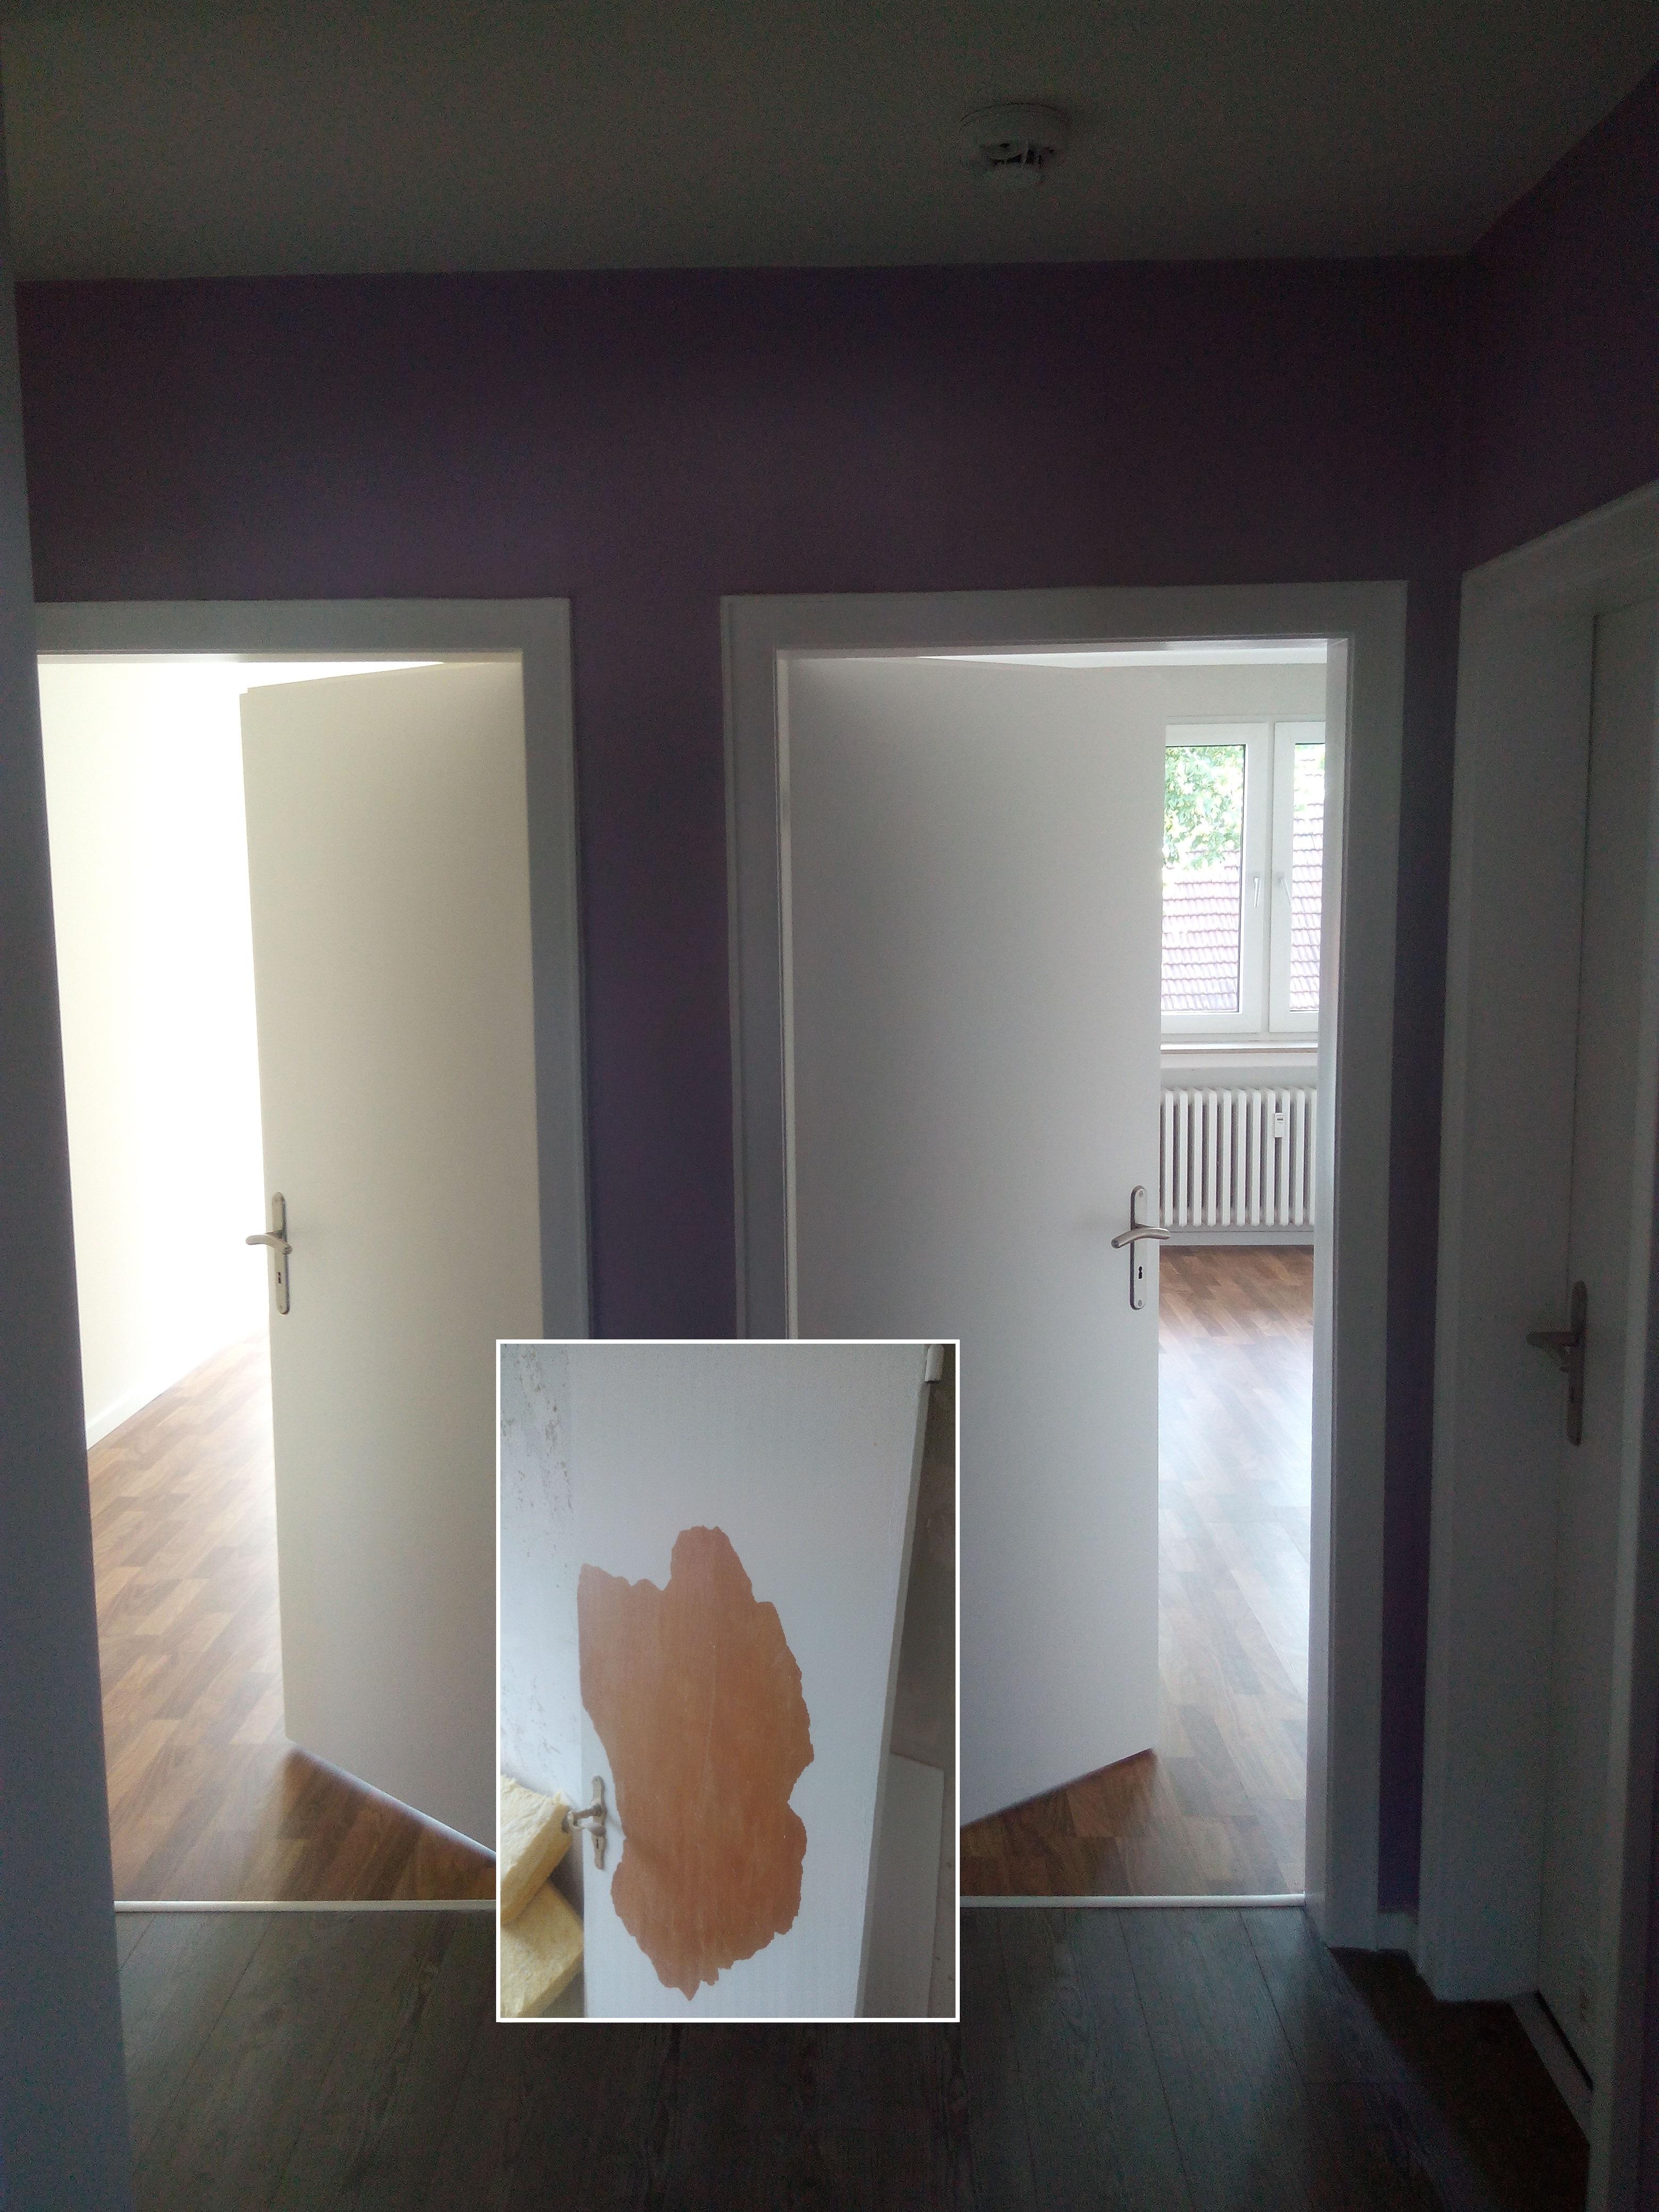 img 20170731 095202 malerbetrieb jansen nordhorn. Black Bedroom Furniture Sets. Home Design Ideas